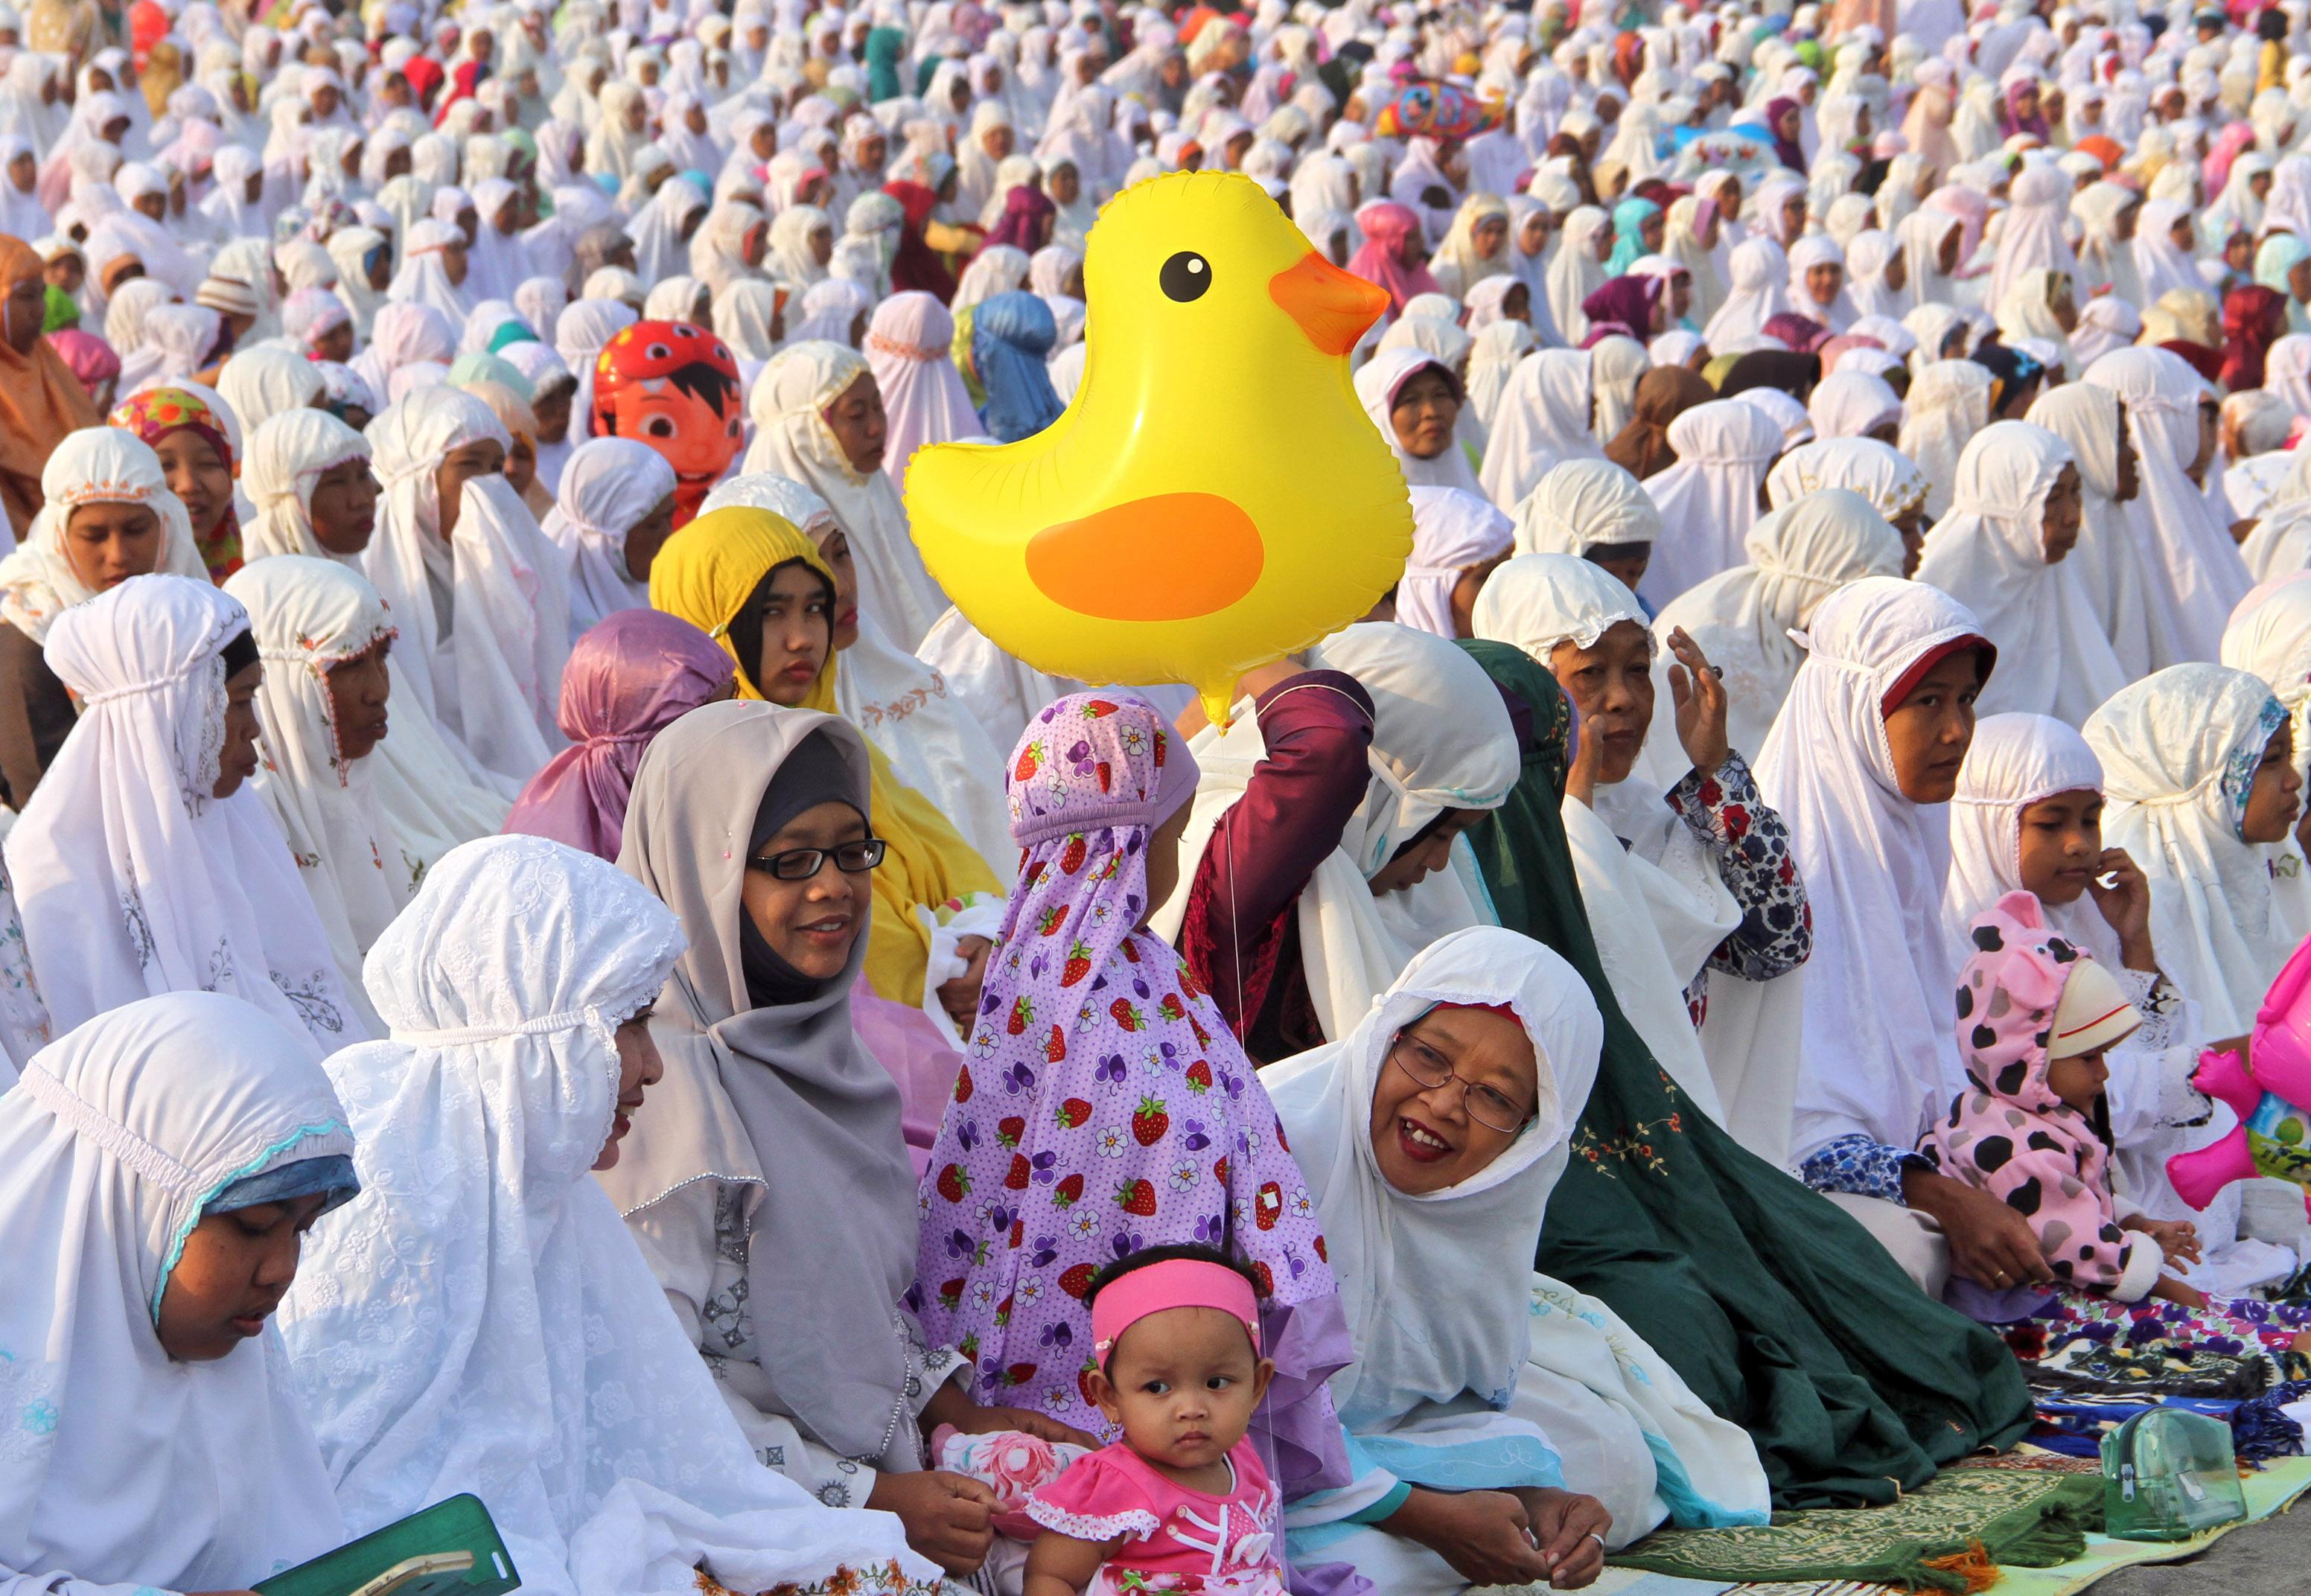 Beautiful China Eid Al-Fitr Feast - 6369_446  Pictures_207986 .jpeg